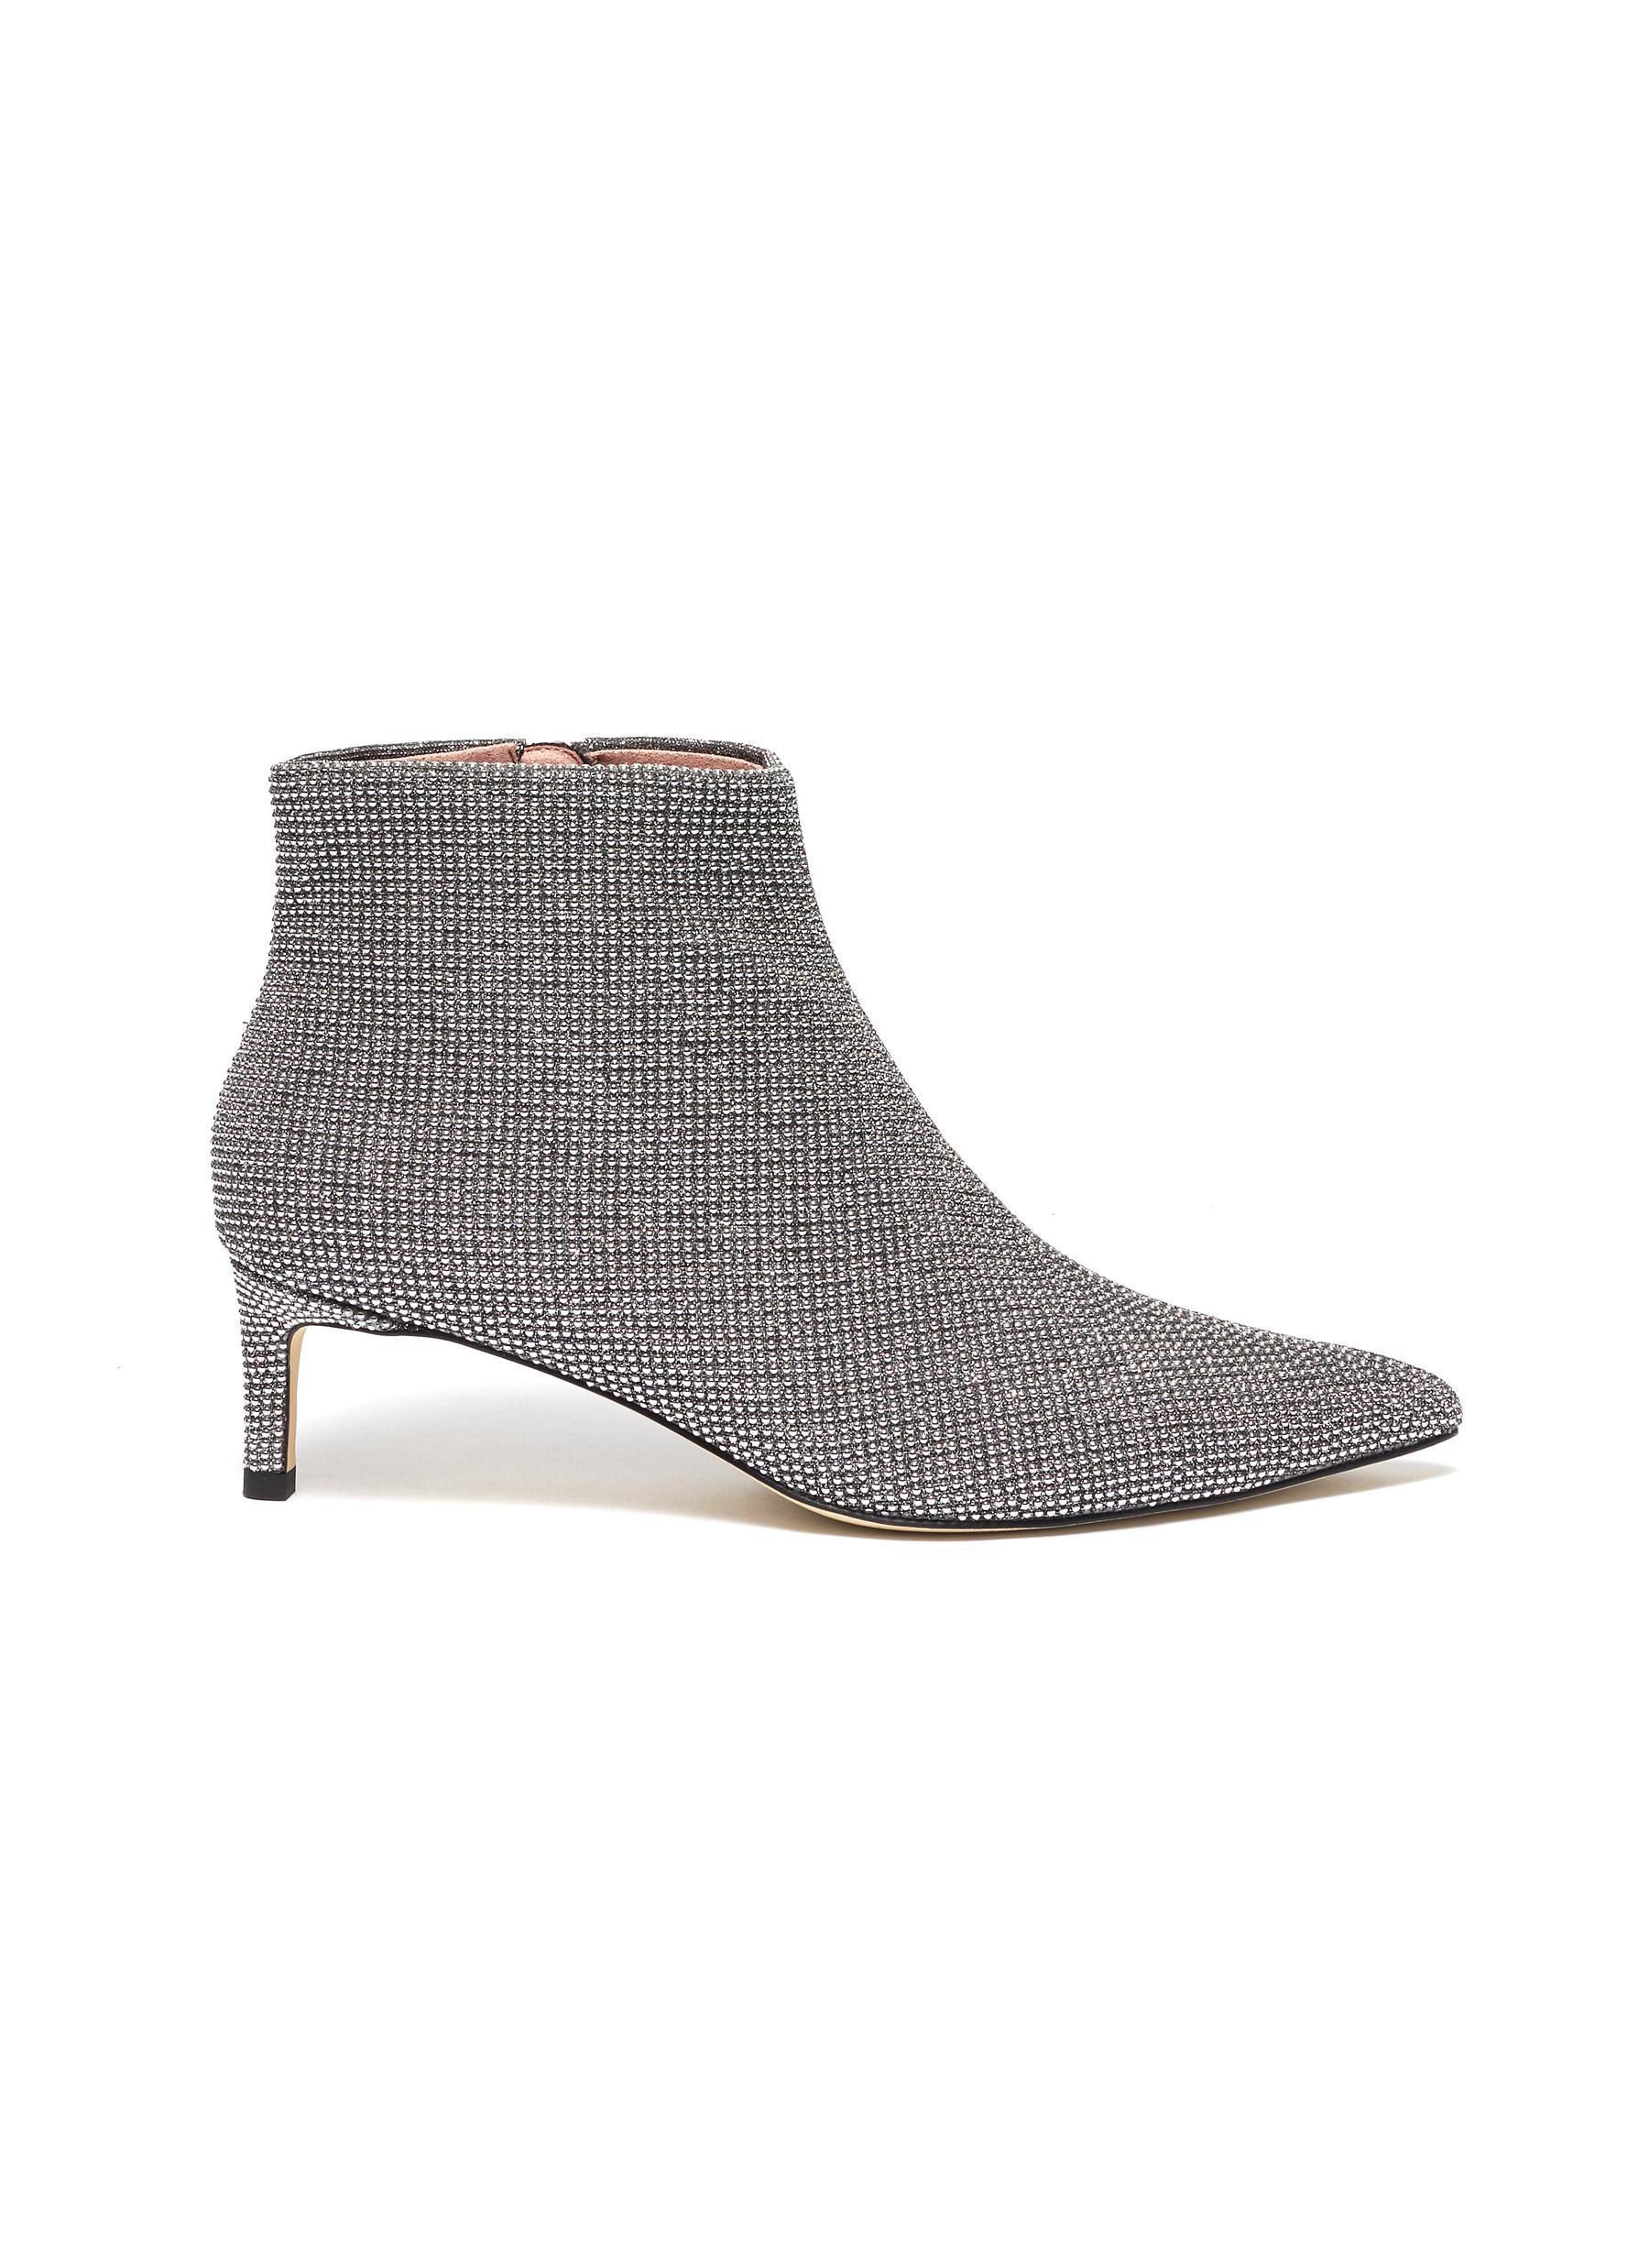 Bernarda glitter ankle boots by Pedder Red